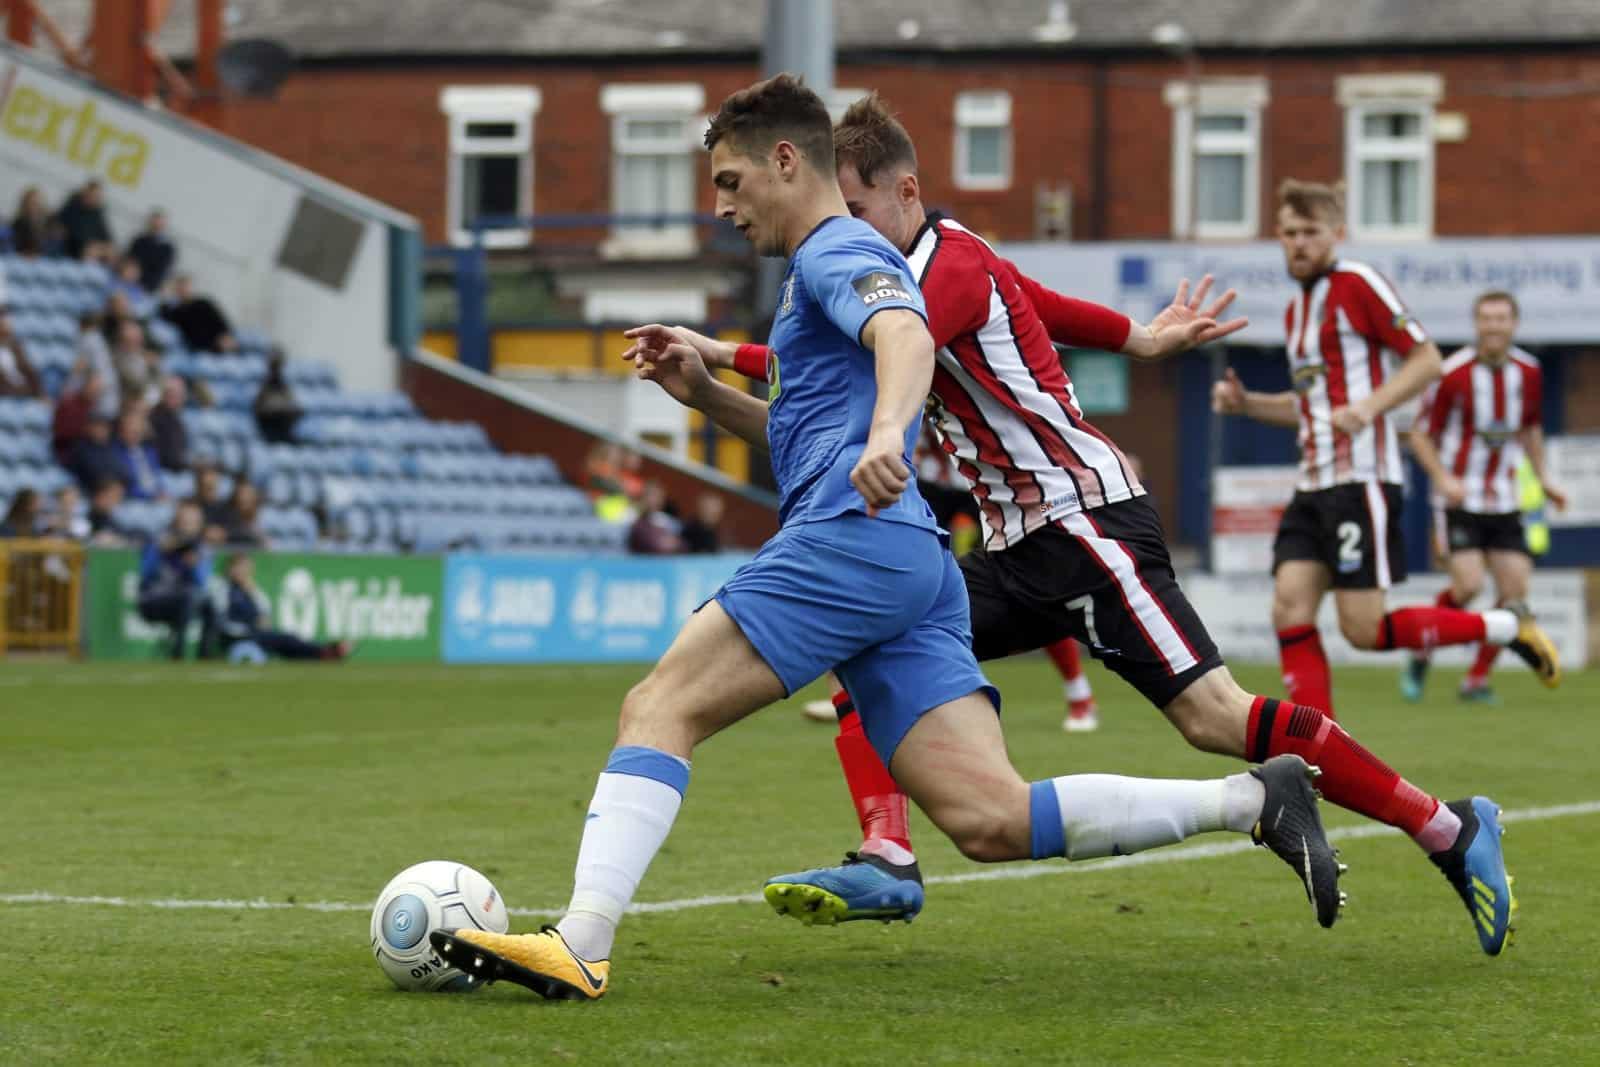 Scott Duxbury. Stockport County FC 2-0 Altrincham FC. Emirates FA Cup